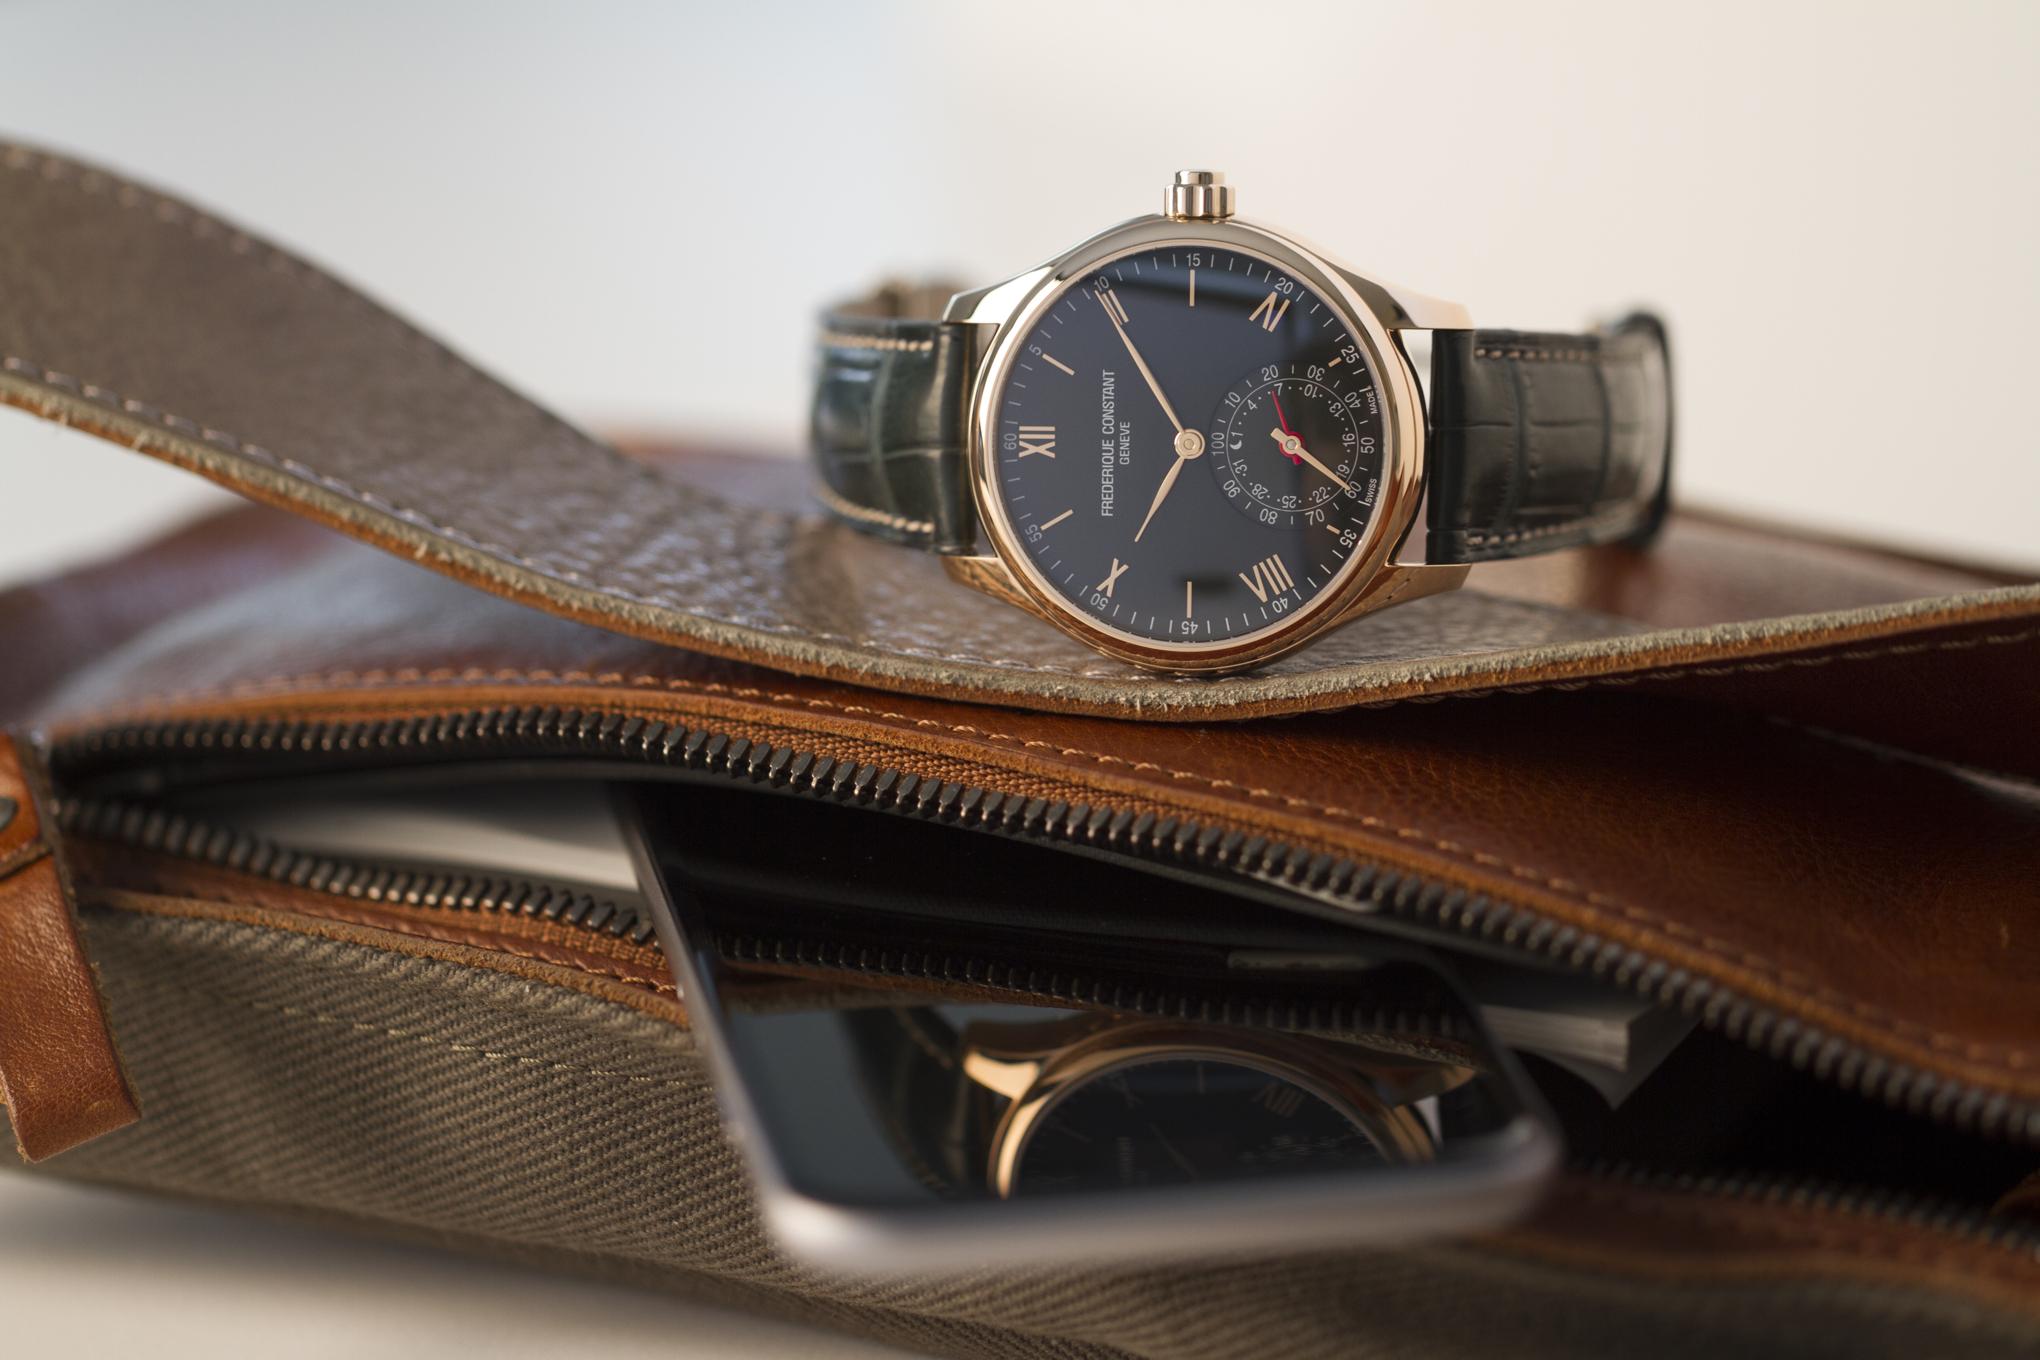 Mua đồng hồ Frederique Constant thay vì Lamborghini huyền thoại ?